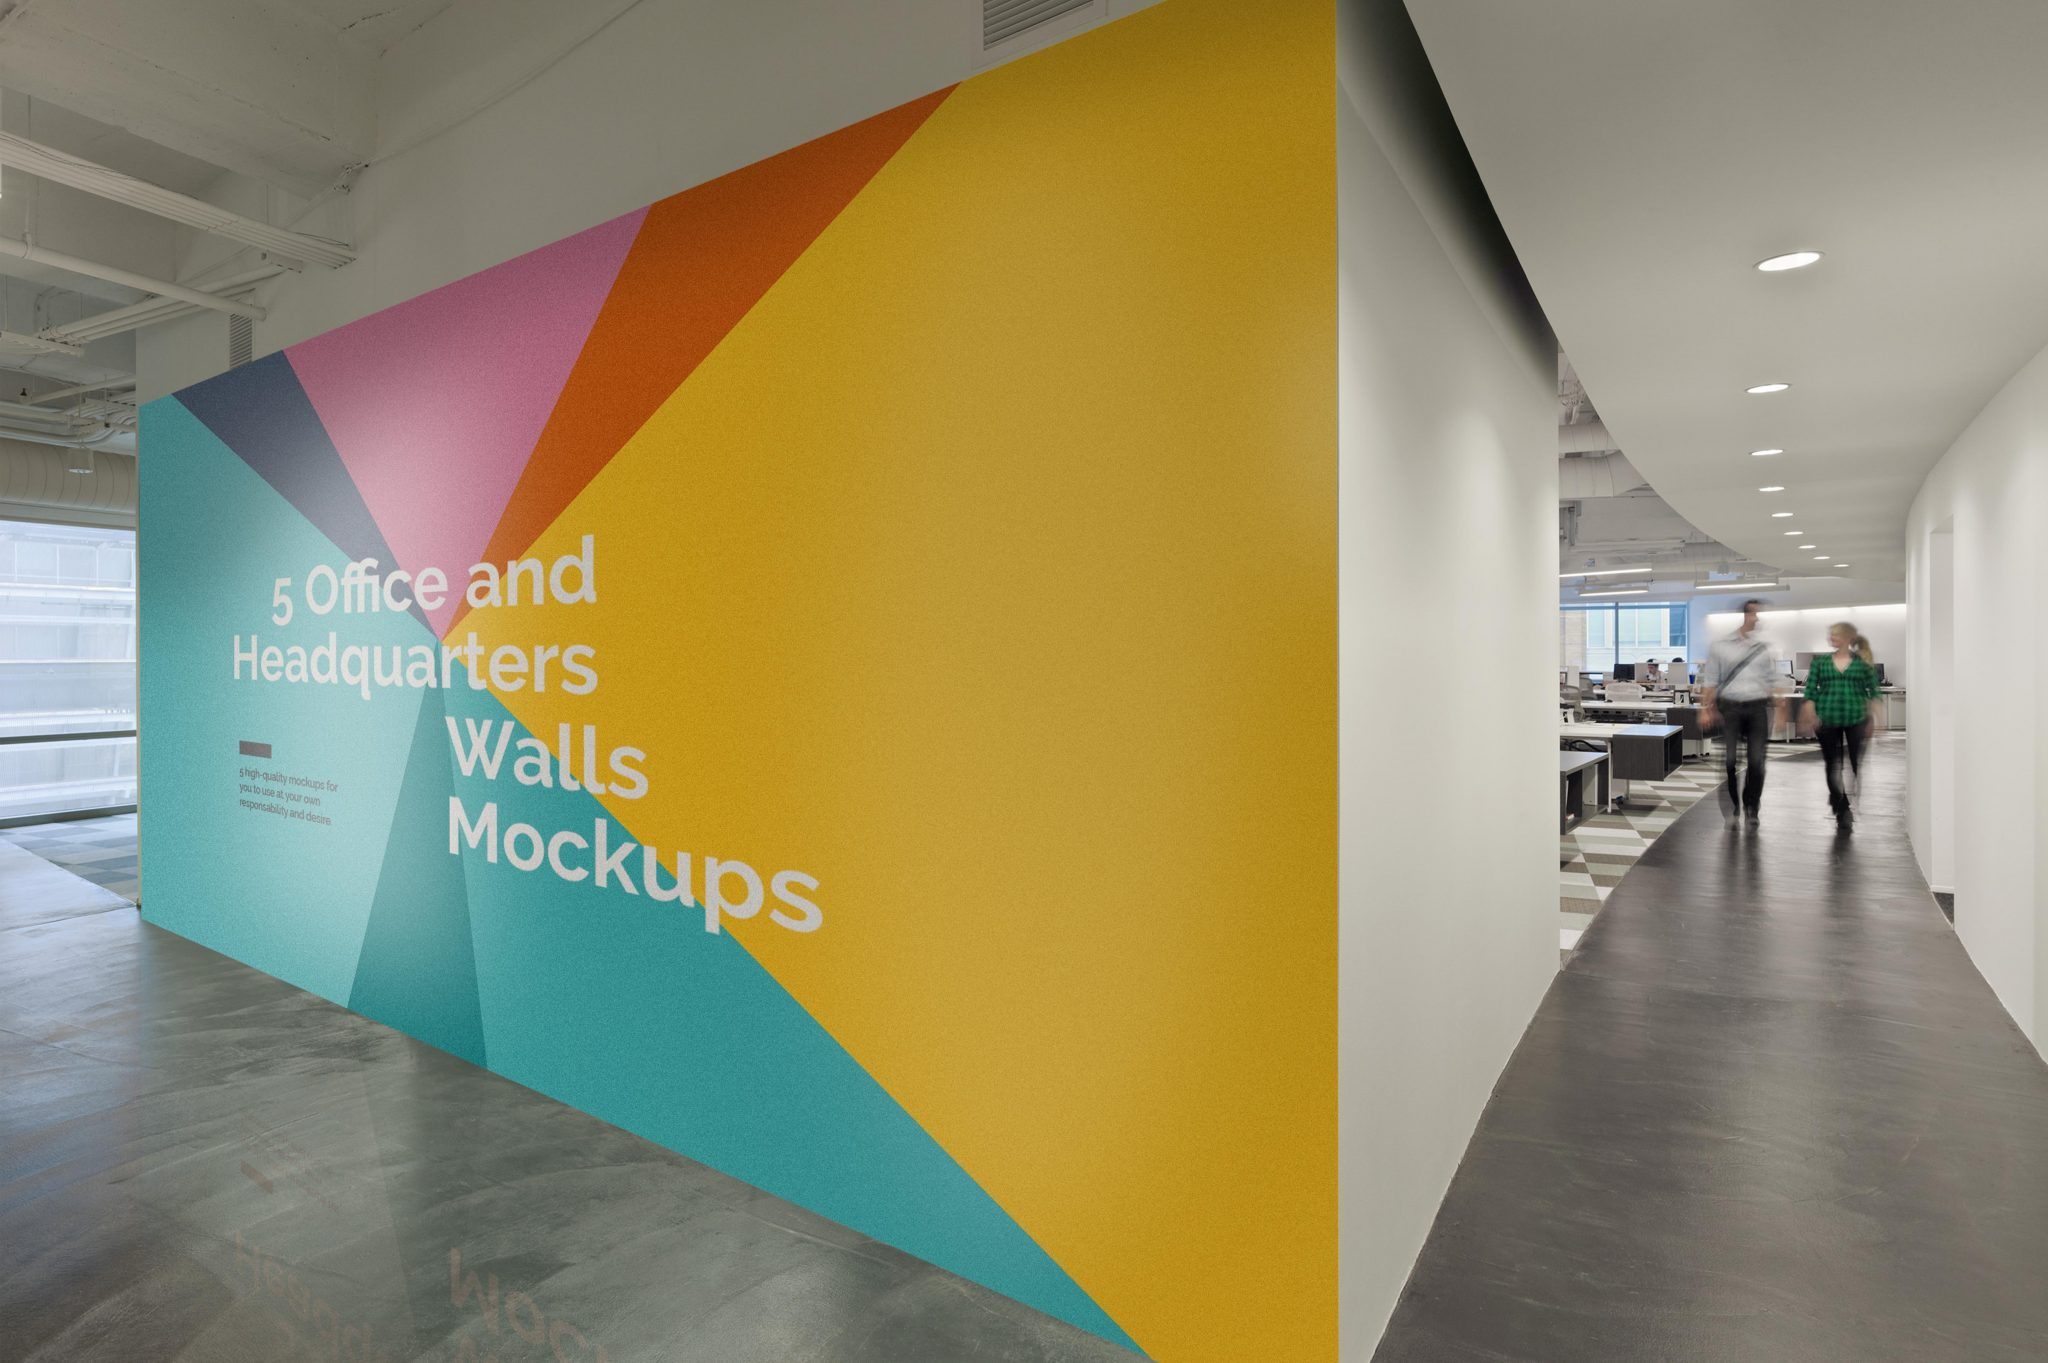 5 Office Headquarters Walls Mockups Mockupslib